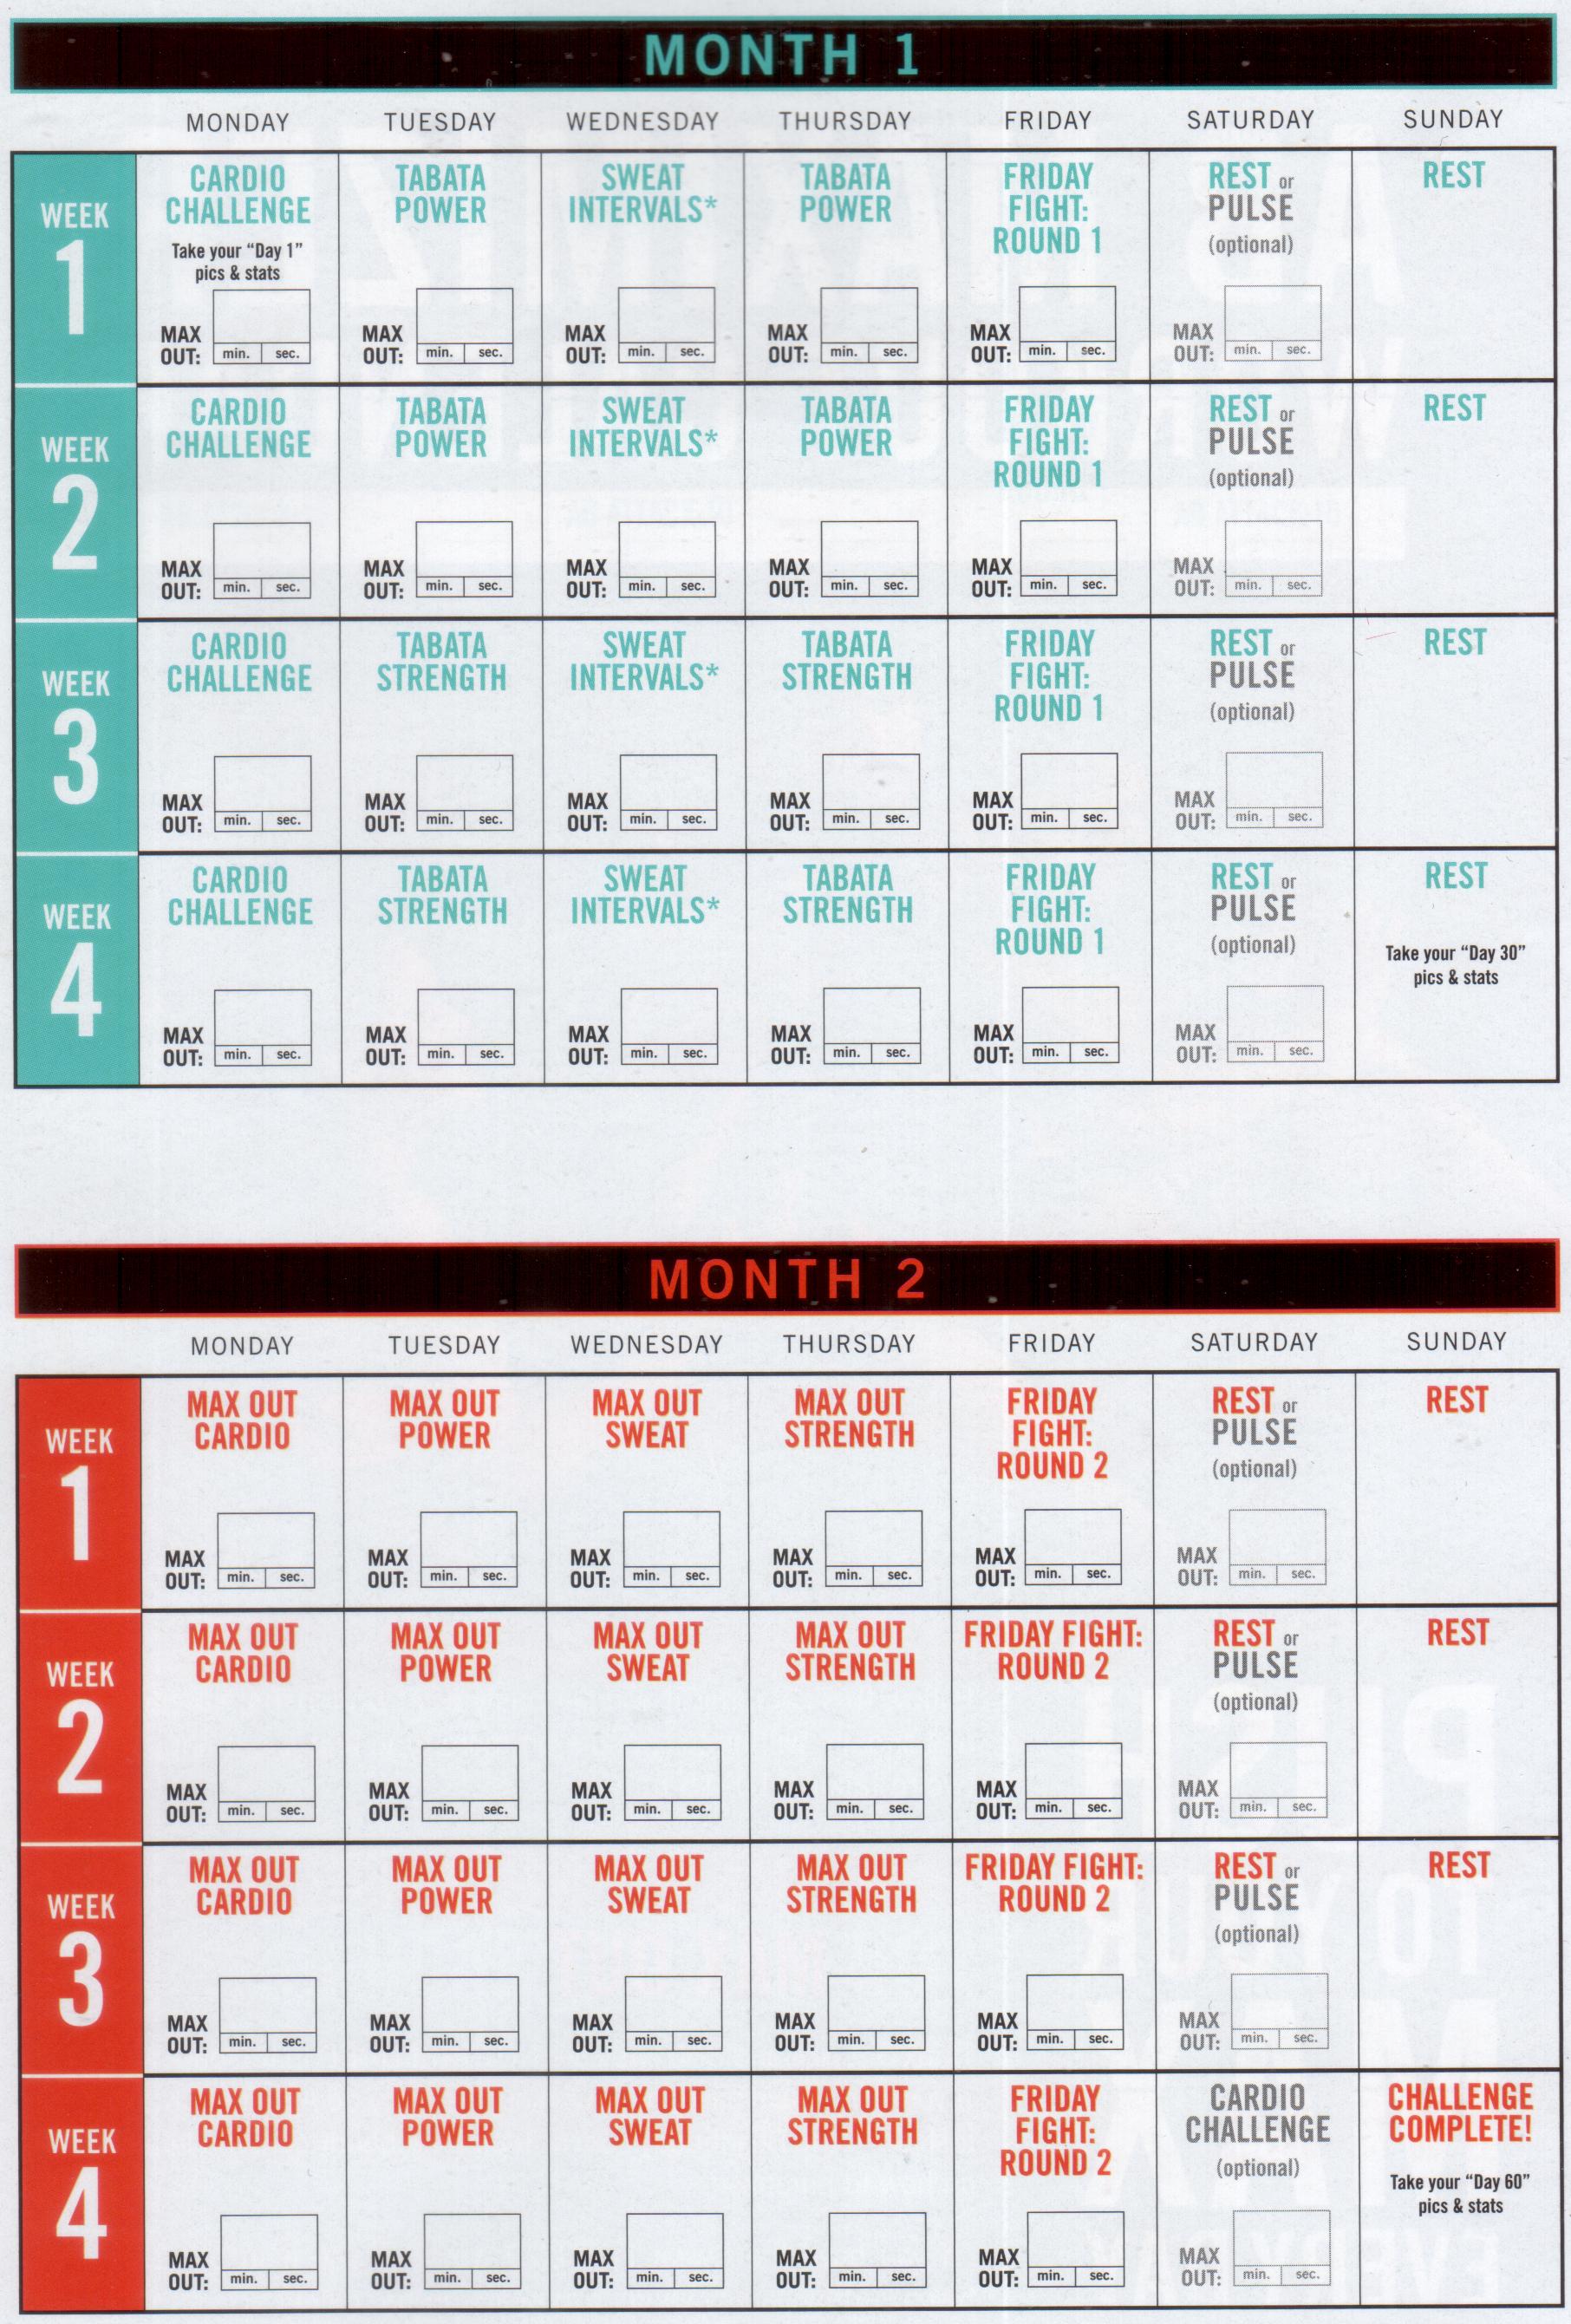 Schedule | Insanity Max 30, Insanity Max 30 Schedule in Insanity Calendar Pdf